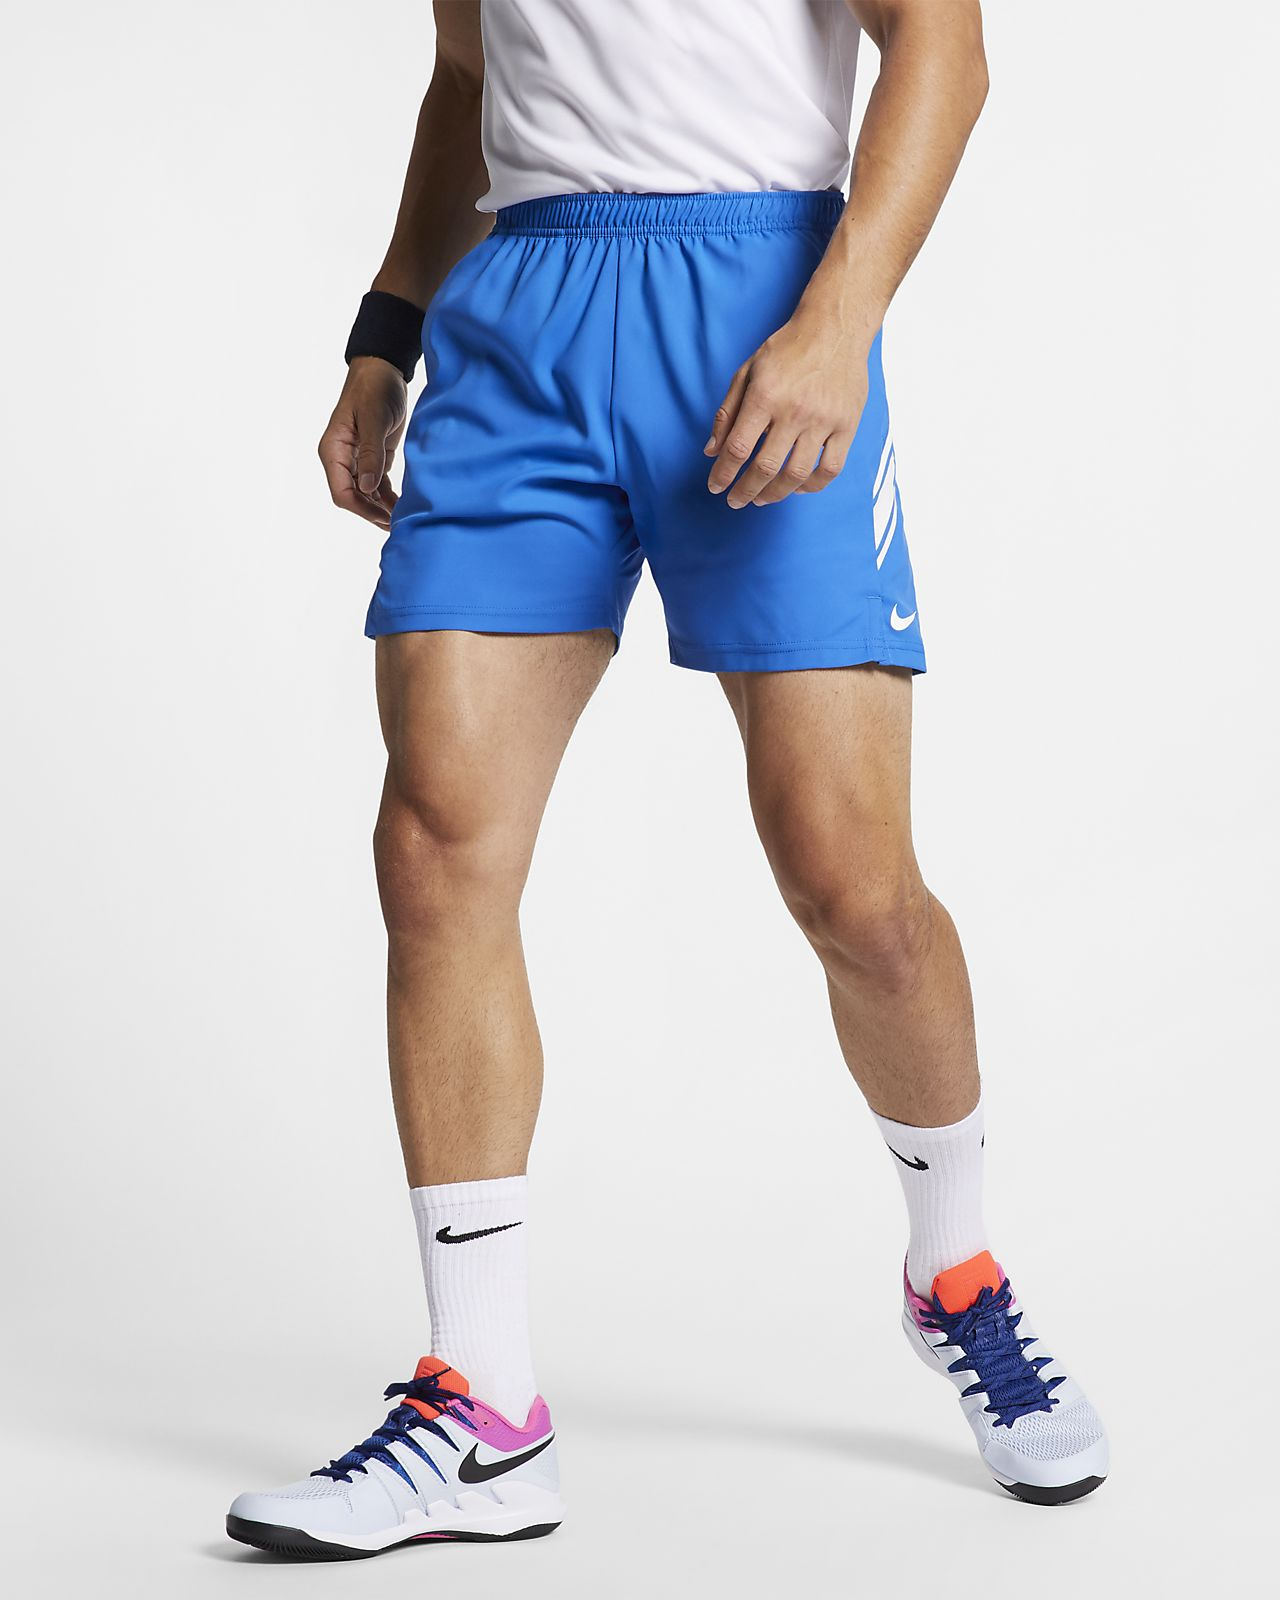 NikeCourt Dri-FIT Erkek Tenis Şortu